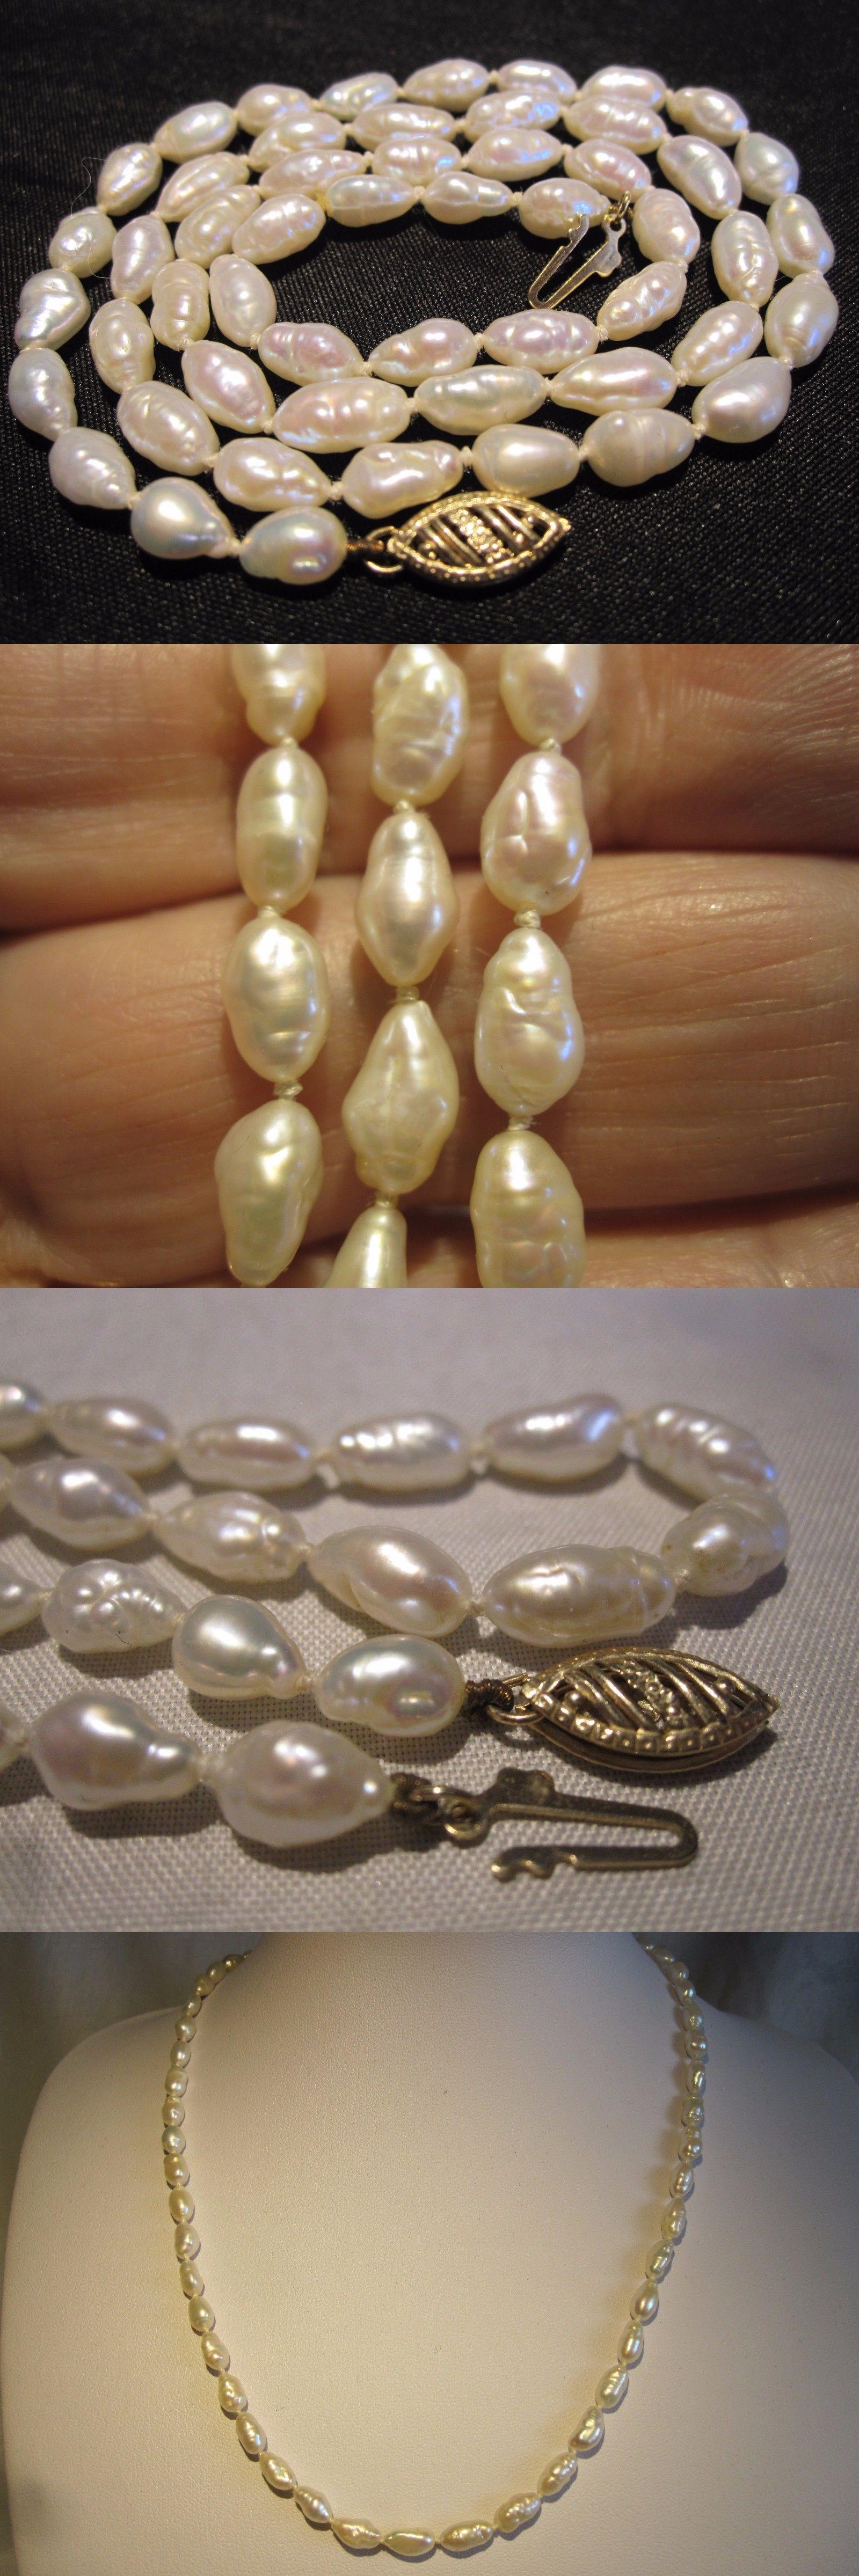 white decorative rocks for vases of 30 pearl vase fillers the weekly world throughout pearl elegant vtg 14k gold genuine big baroque white 9 5 mm